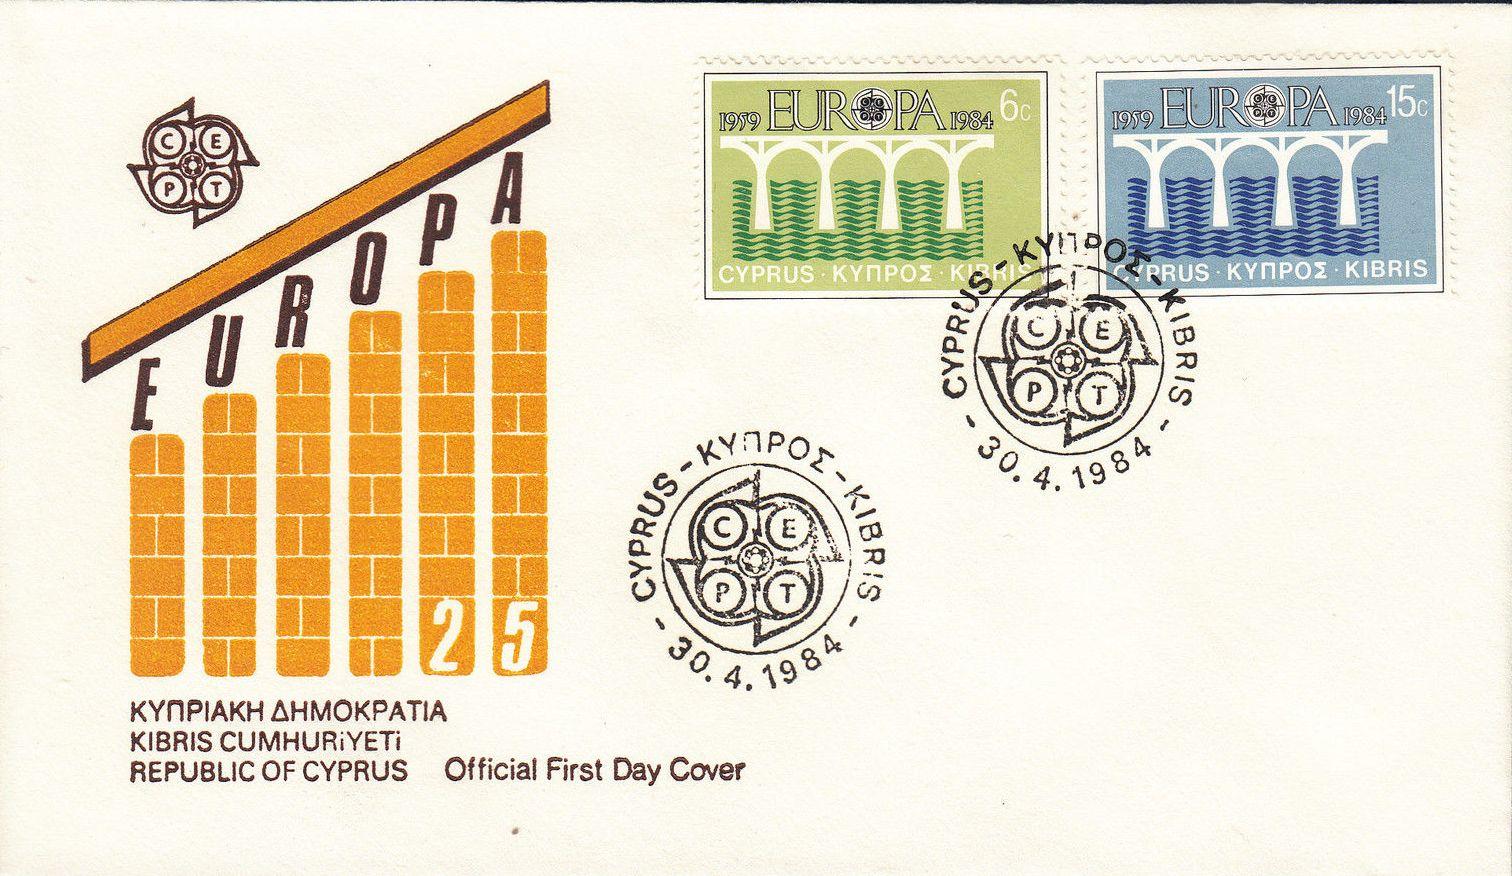 Cyprus 1984 EUROPA - CEPT FDCa.jpg